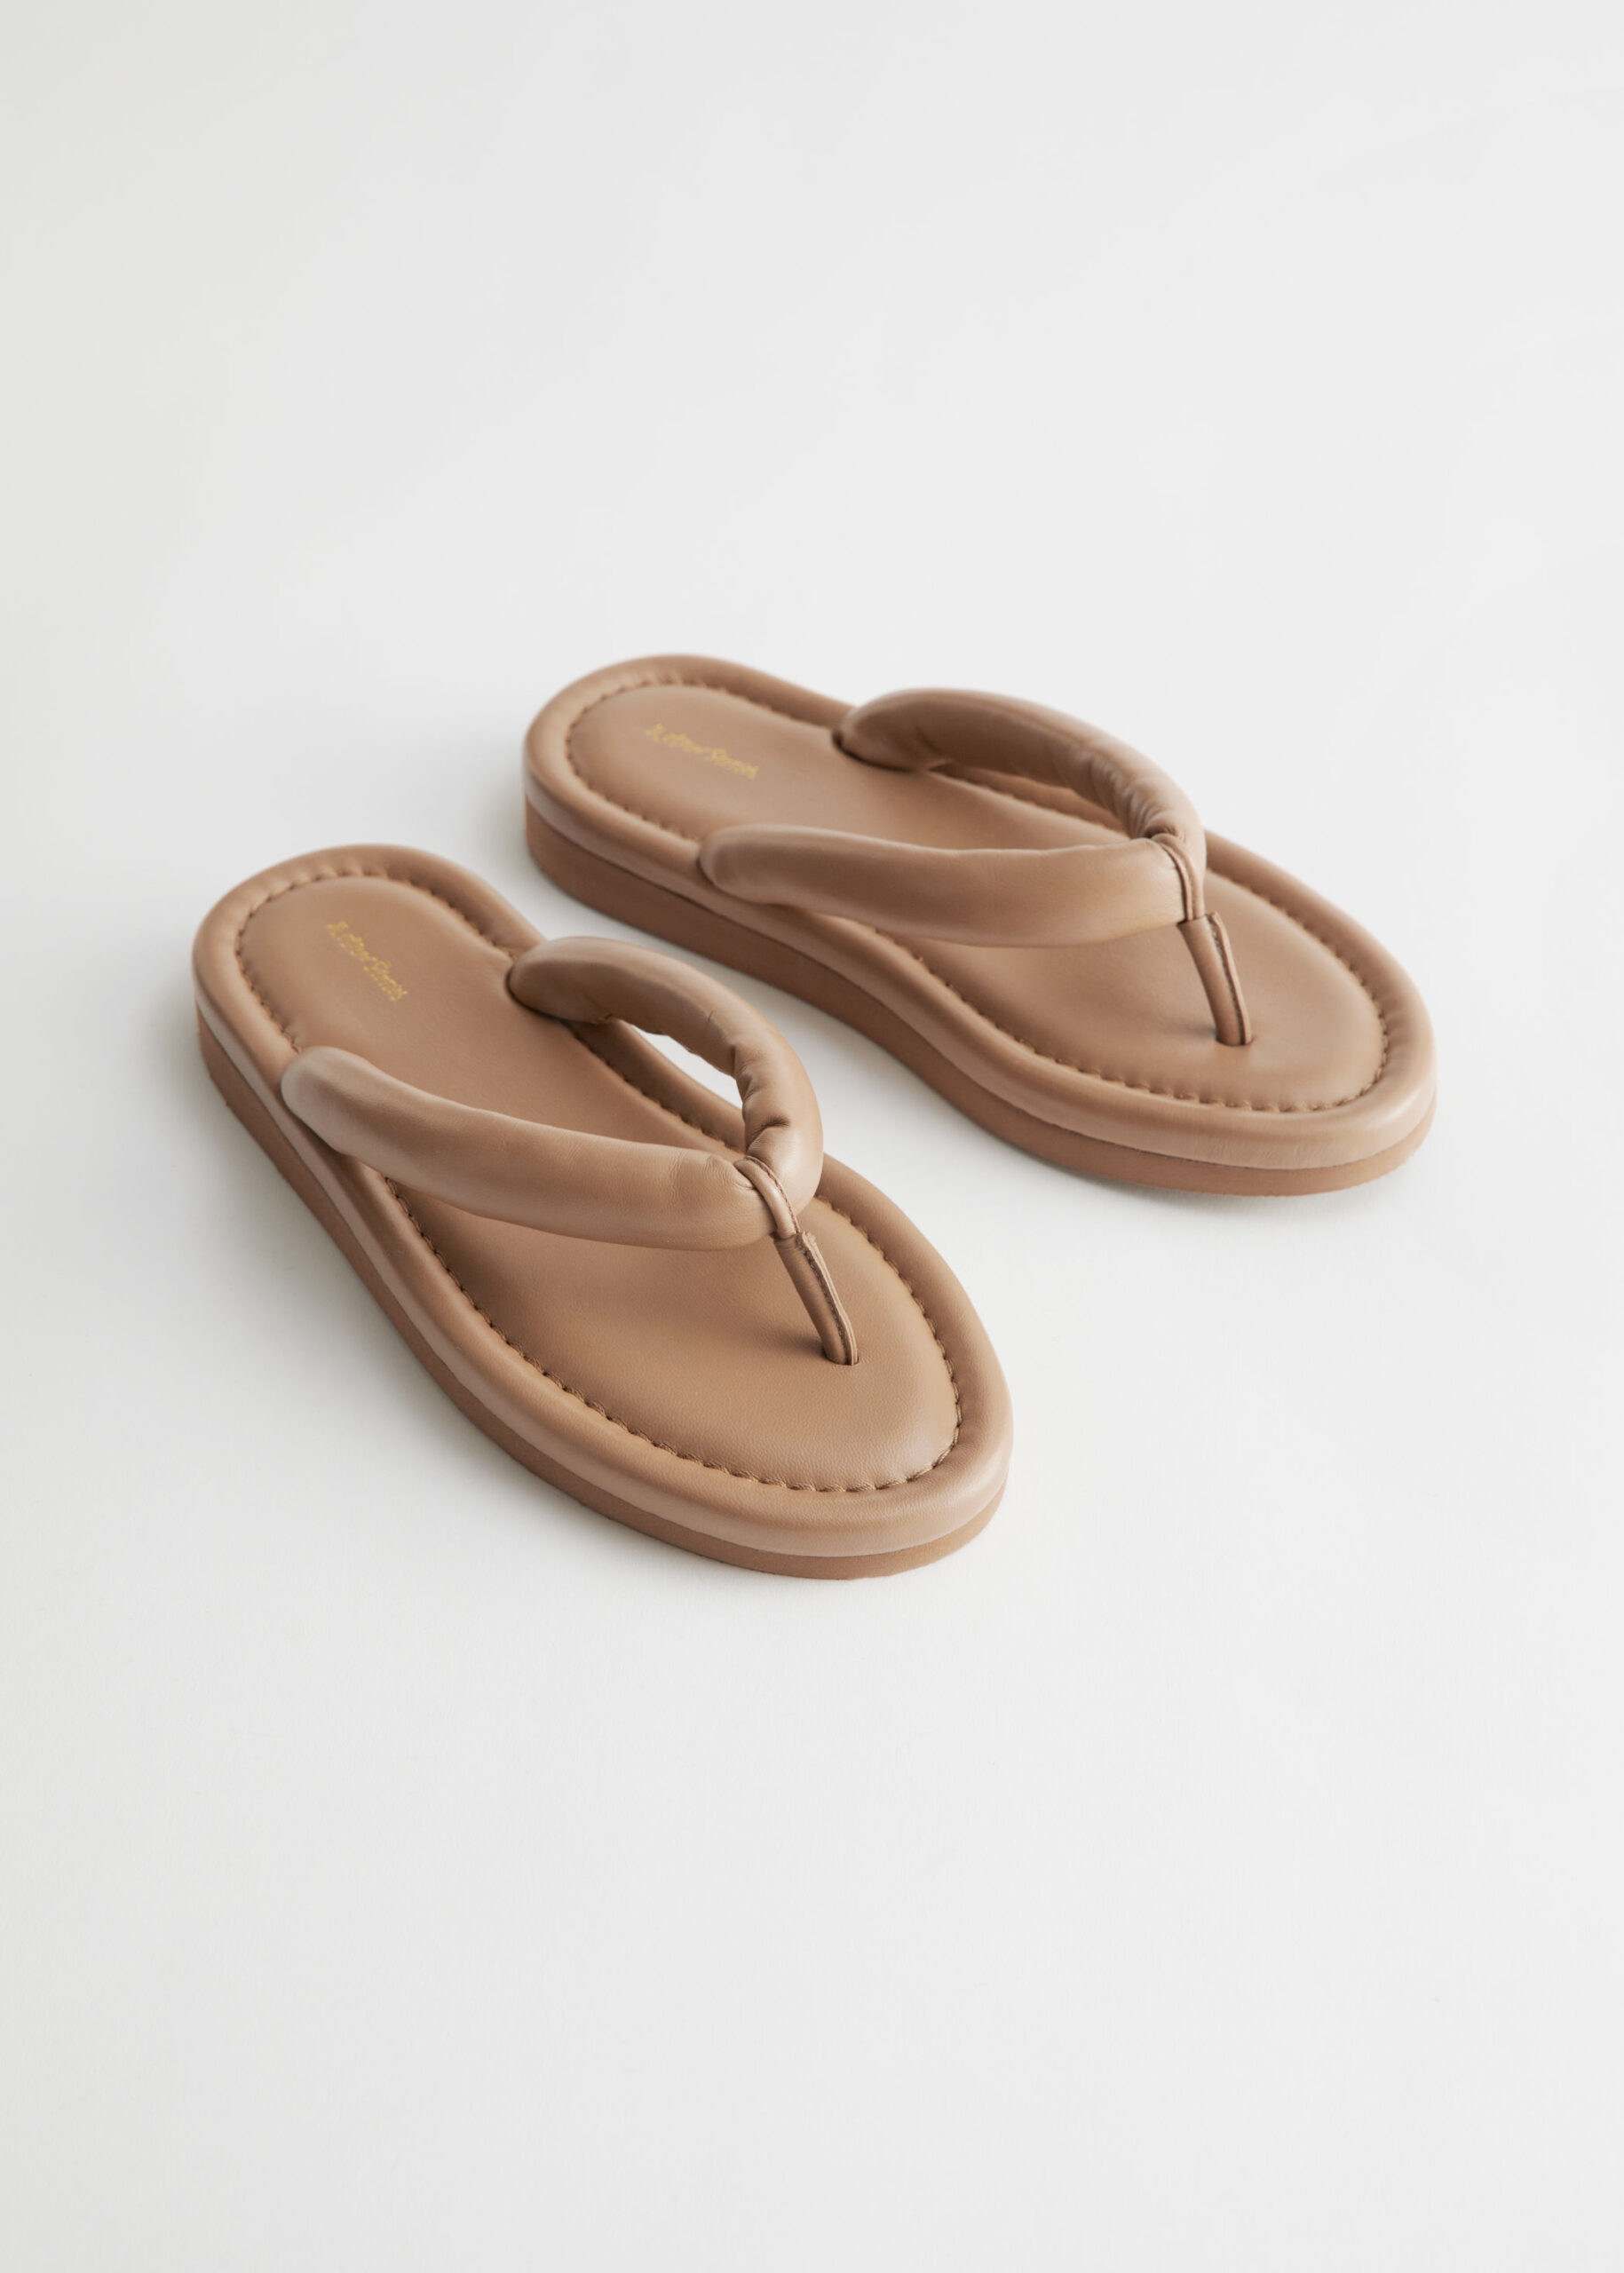 Padded Strap Leather Flip Flops $129